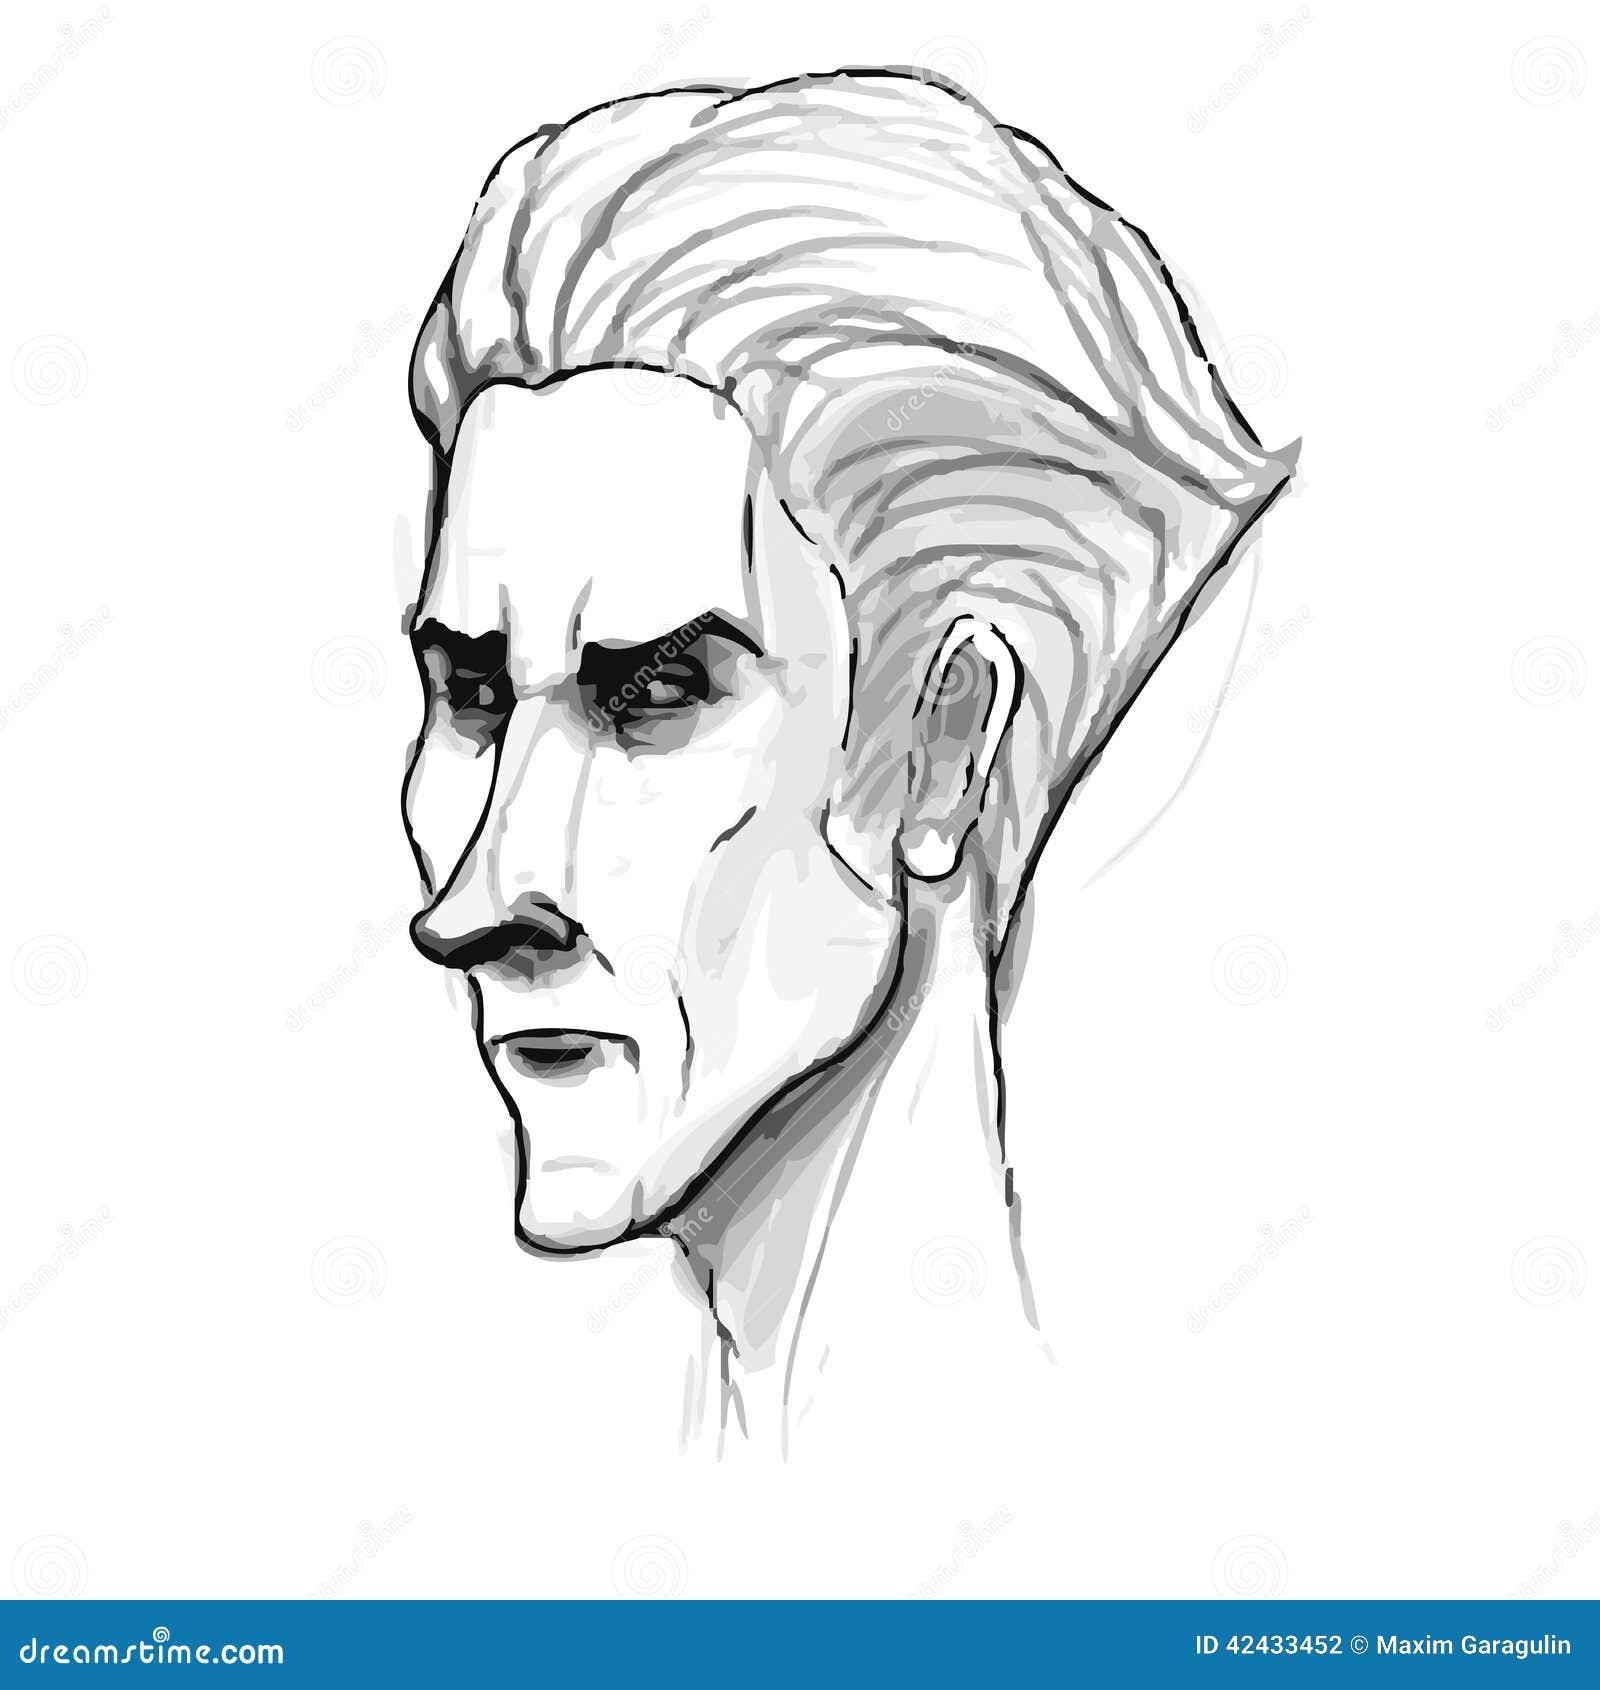 man portrait sketch  pencil drawing imitation in stock